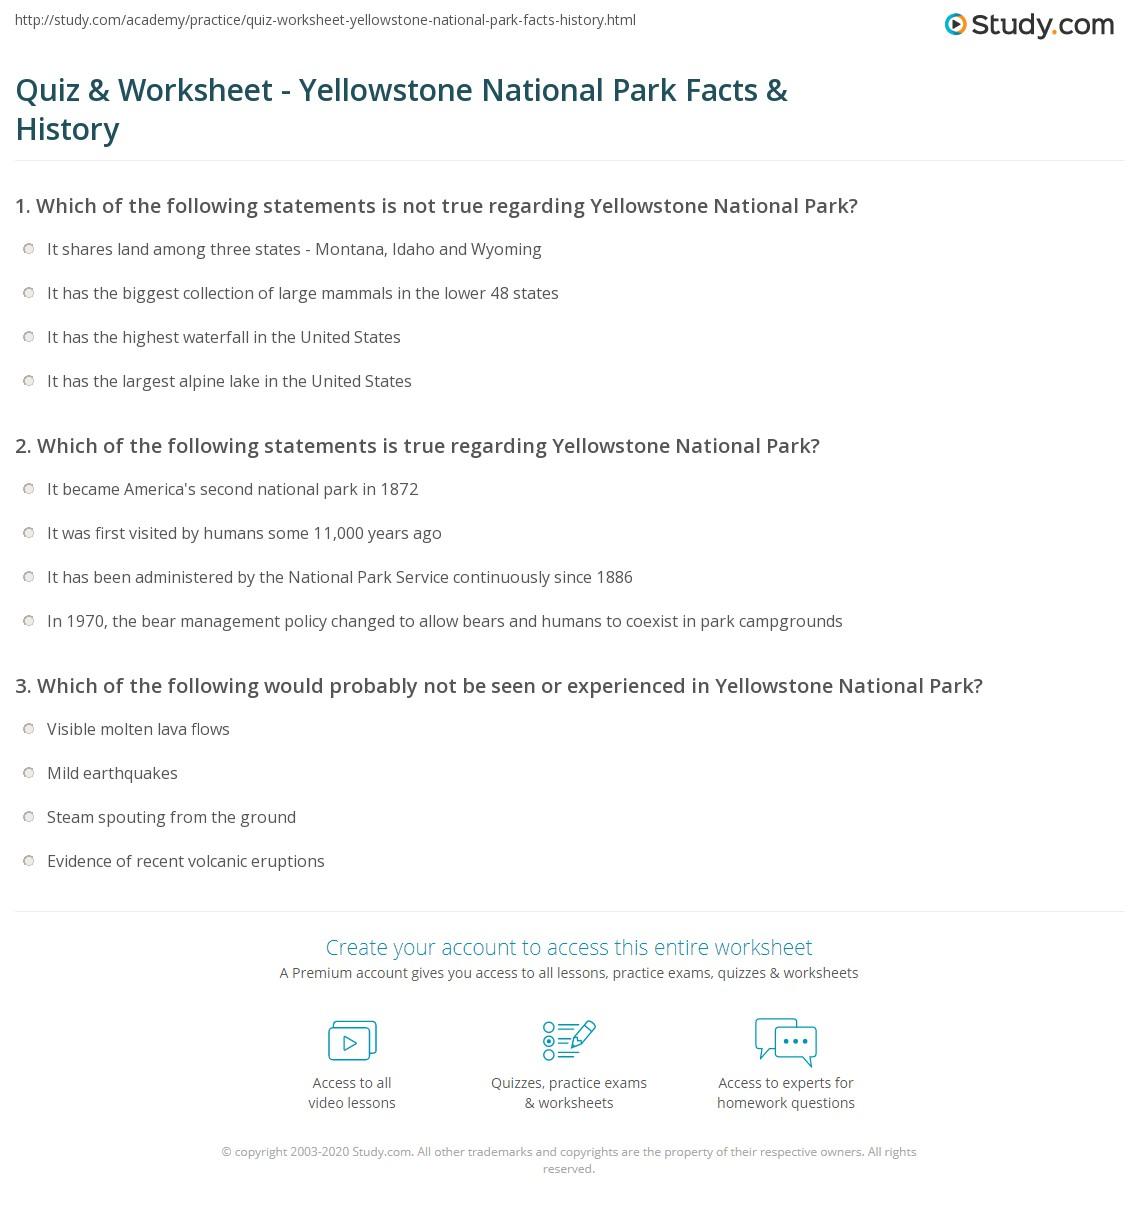 worksheet Yellowstone National Park Worksheets quiz worksheet yellowstone national park facts history study com print location worksheet